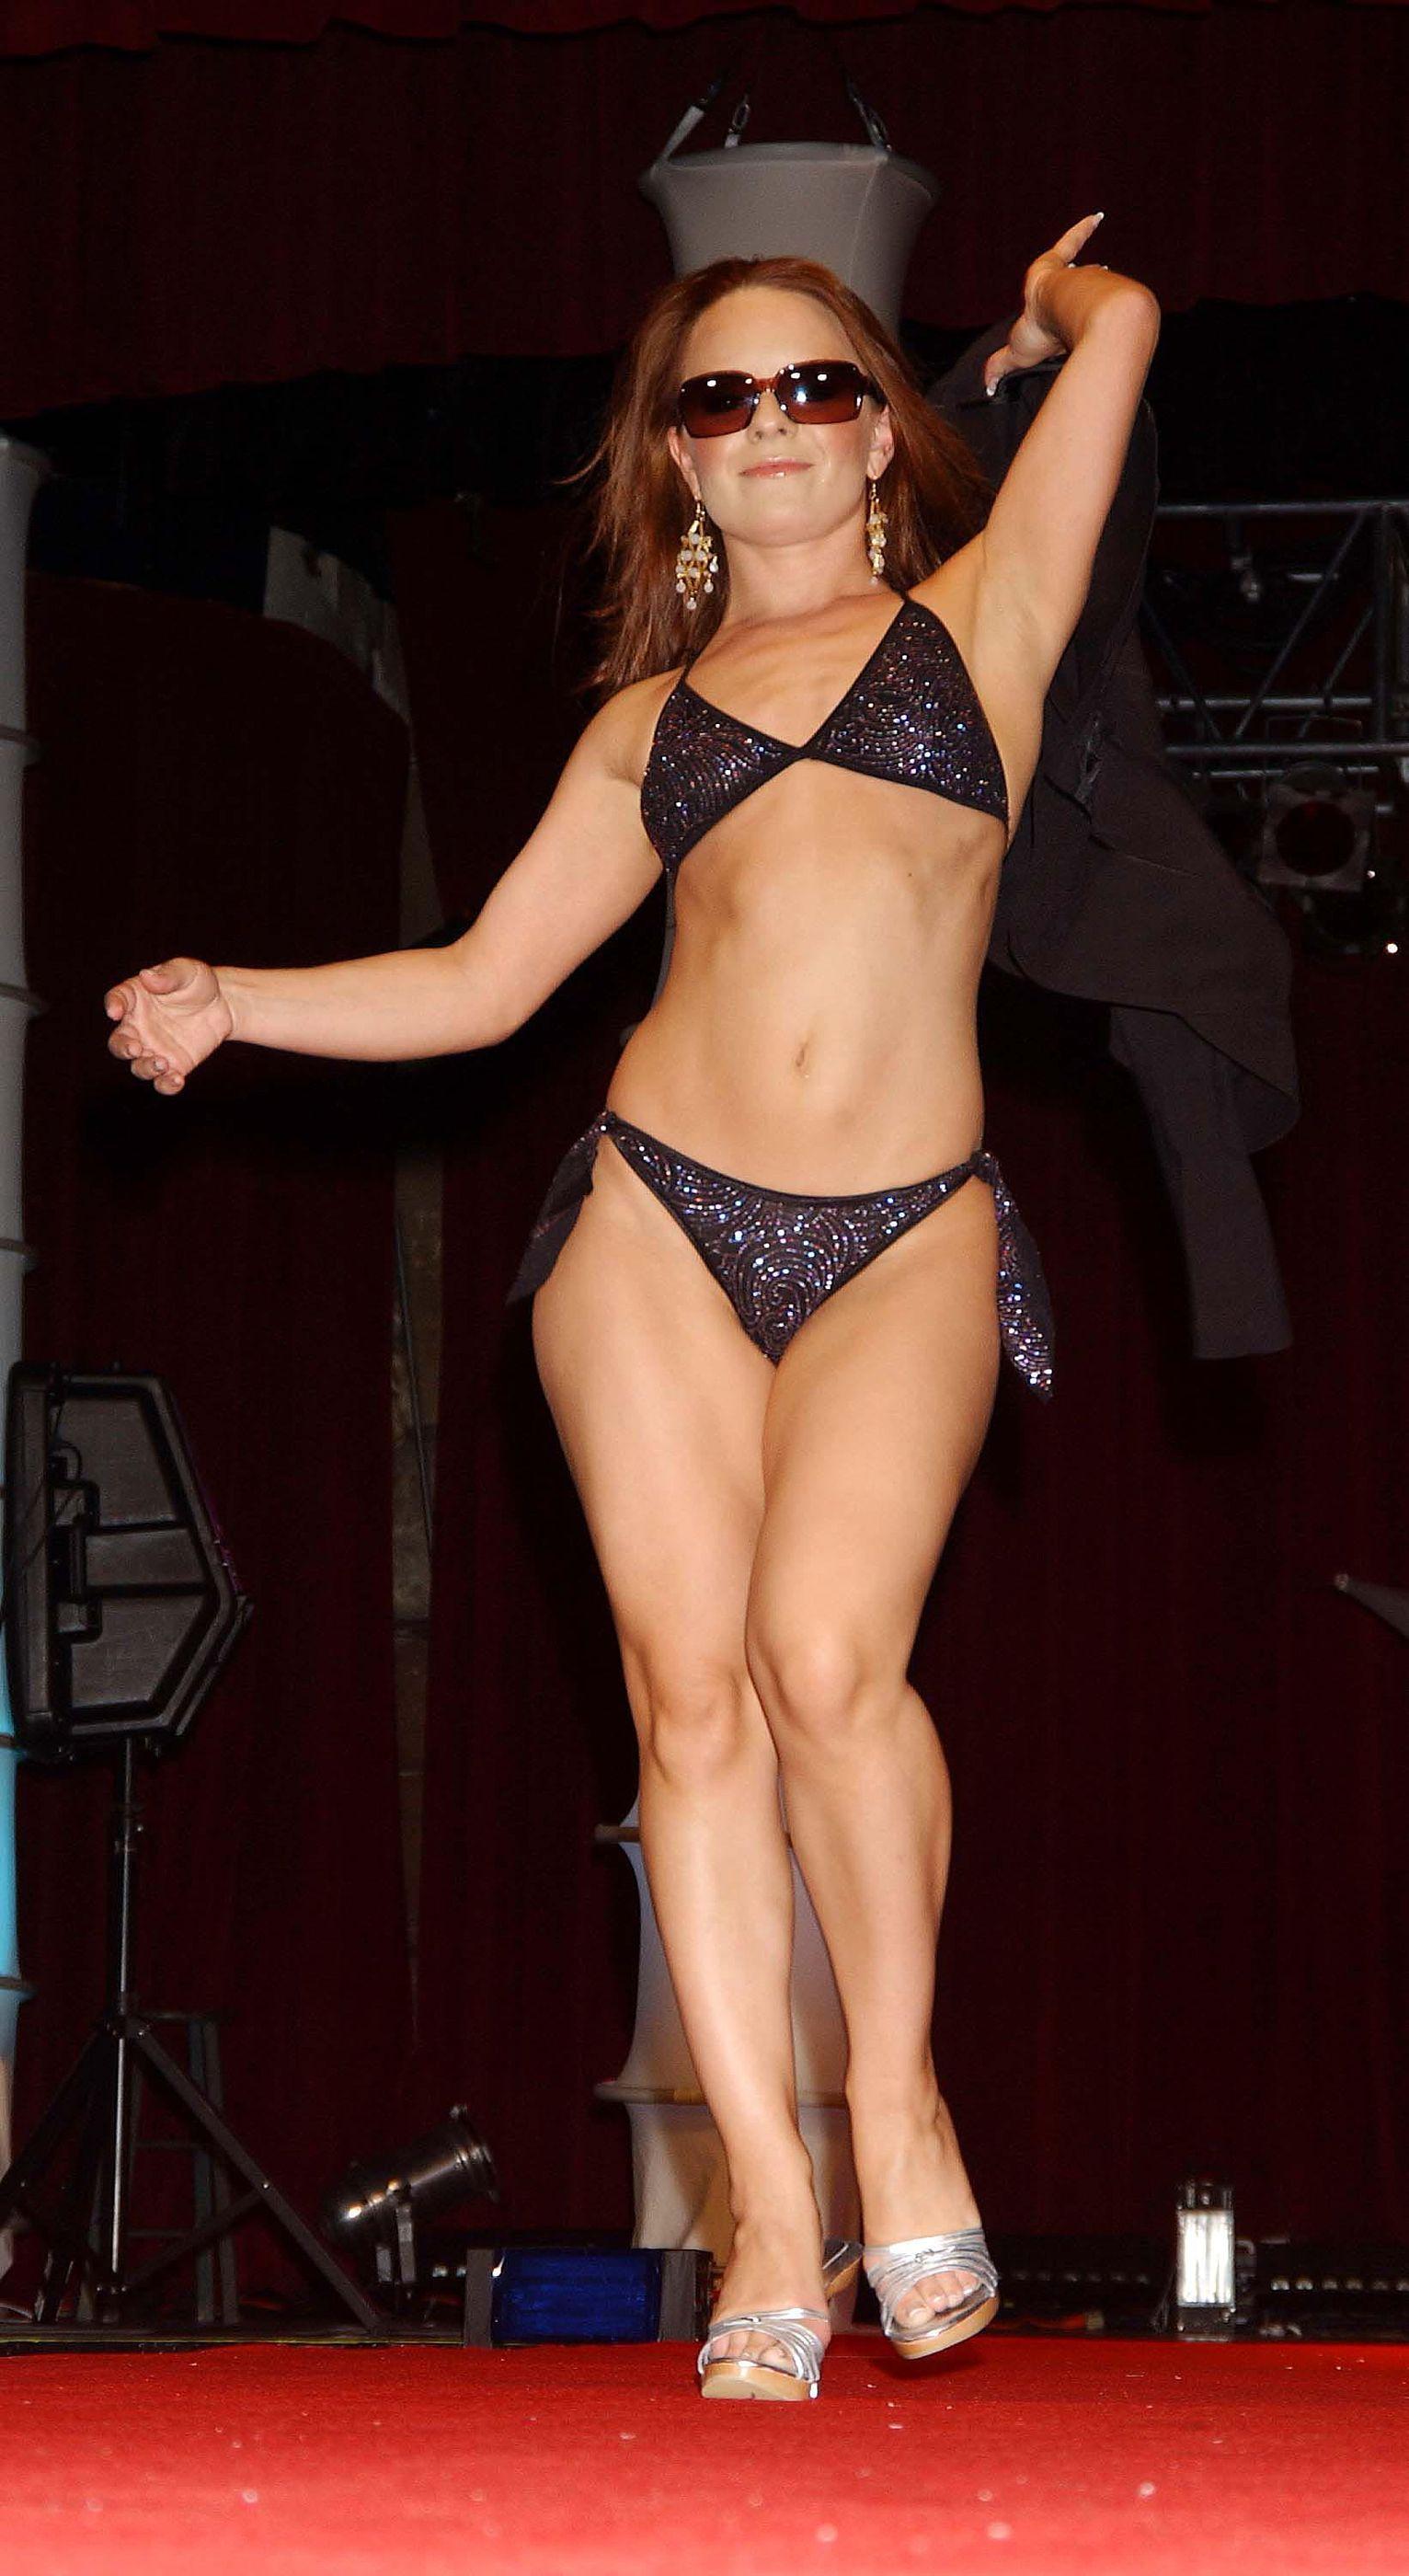 Jenna Von Oy born May 2, 1977 (age 41)